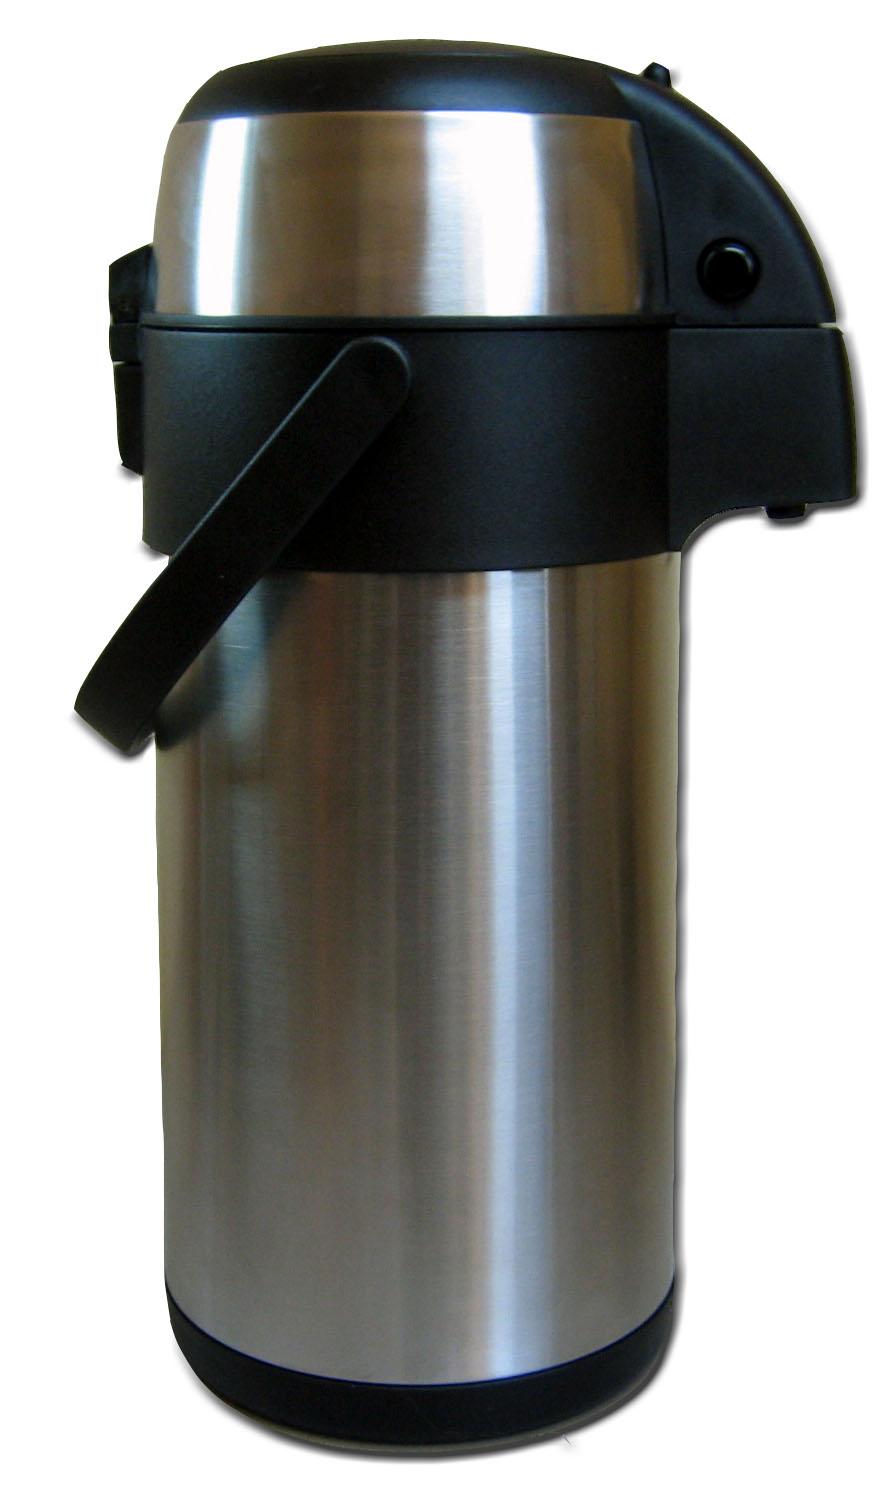 5l airpot edelstahl pumpkanne isolierkanne thermoskanne ebay. Black Bedroom Furniture Sets. Home Design Ideas